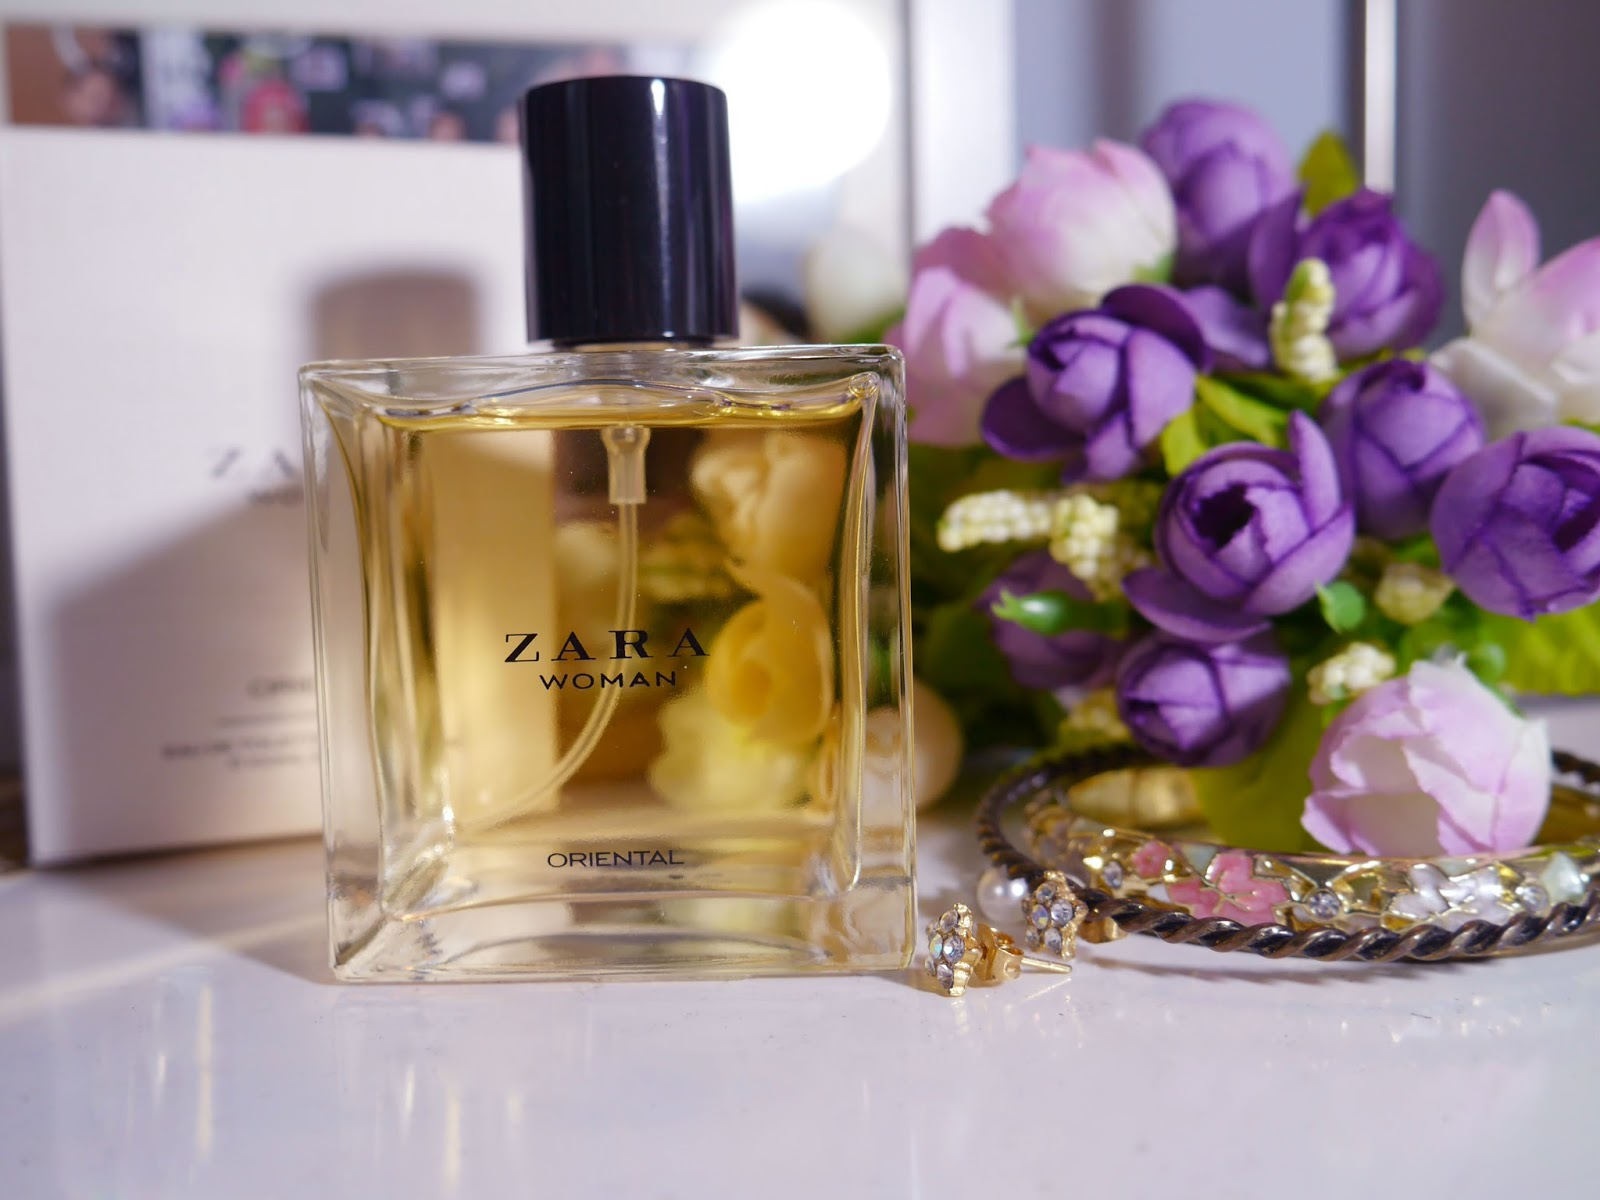 Zara Woman Oriental Eau De Toilette Review Beauty Redemption